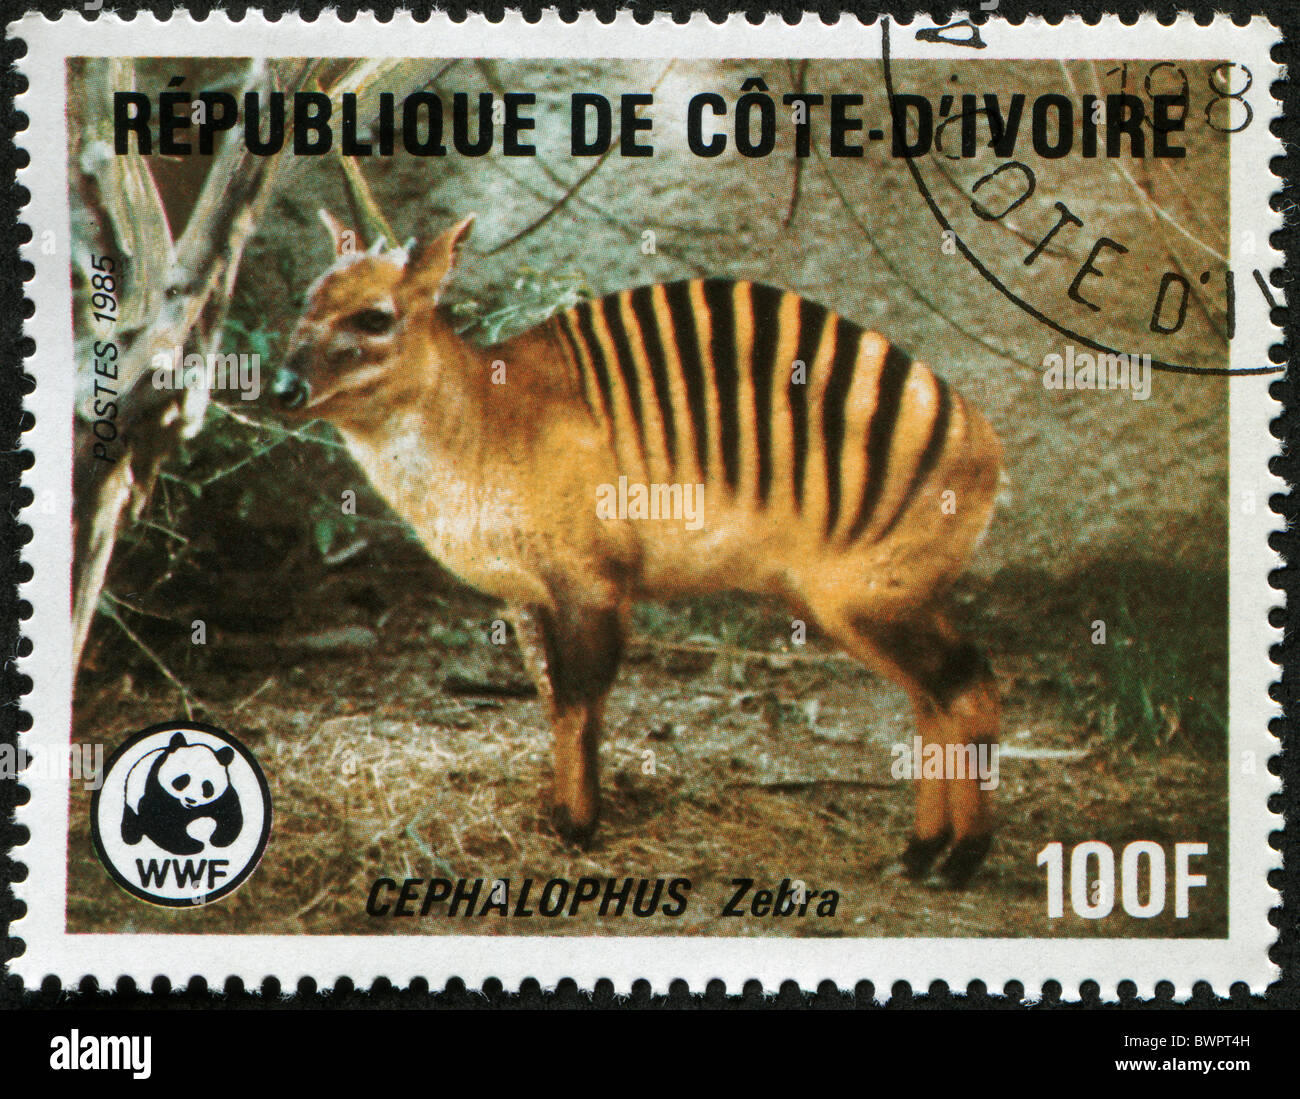 COTE D'IVOIRE - CIRCA 1985: A stamp printed in Republic Cote d'Ivoire shows Zebra Duiker -Cephalophus Zebra, circa Stock Photo